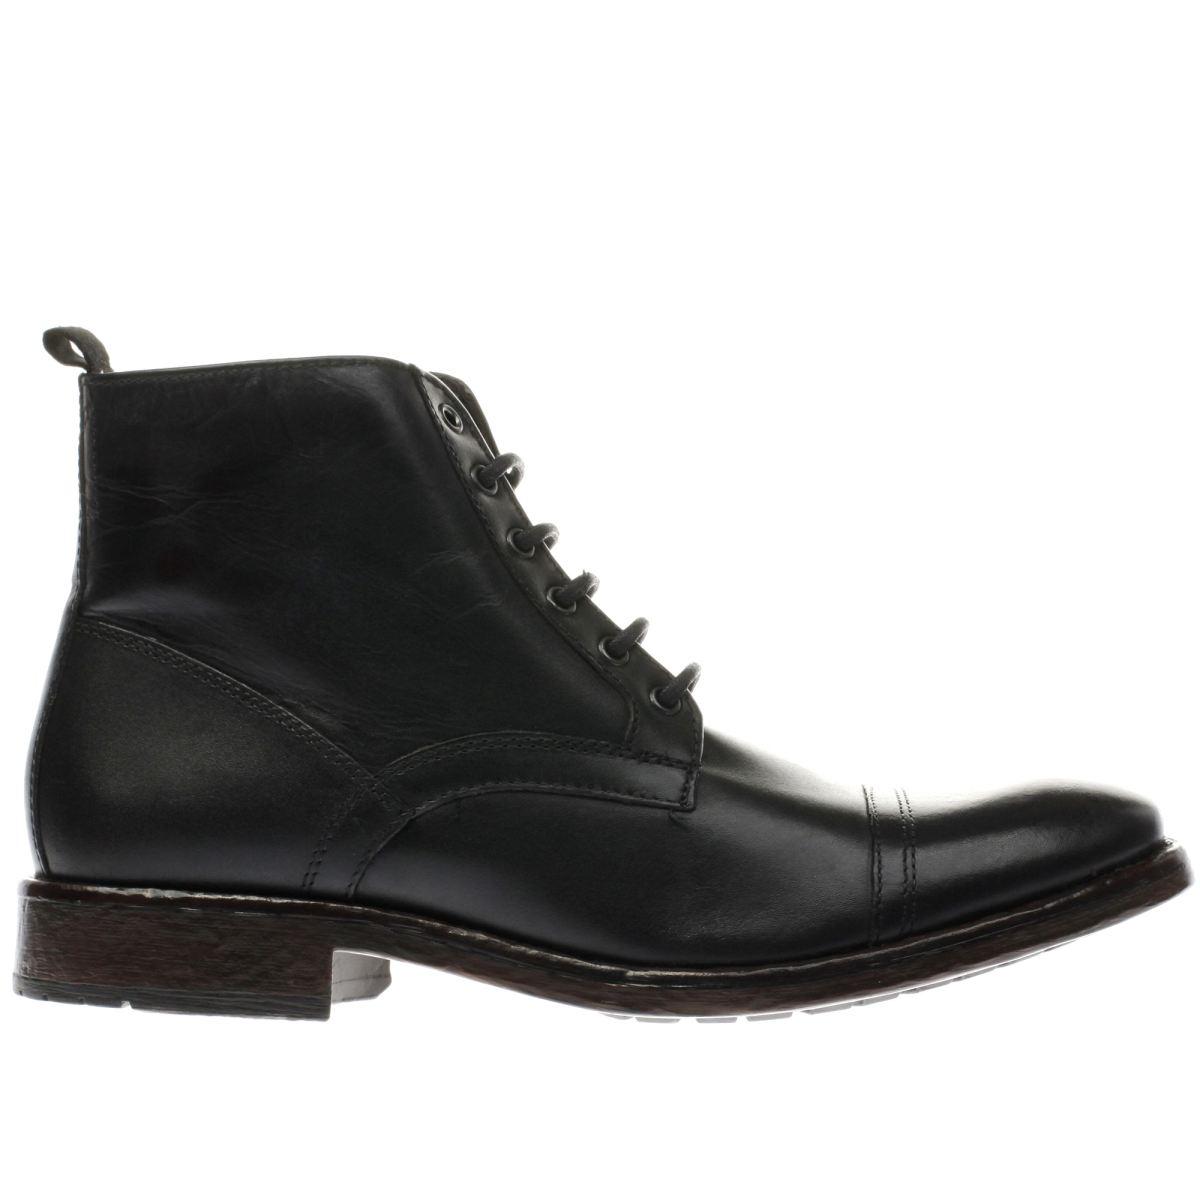 Ikon Black Drake Cap Boots